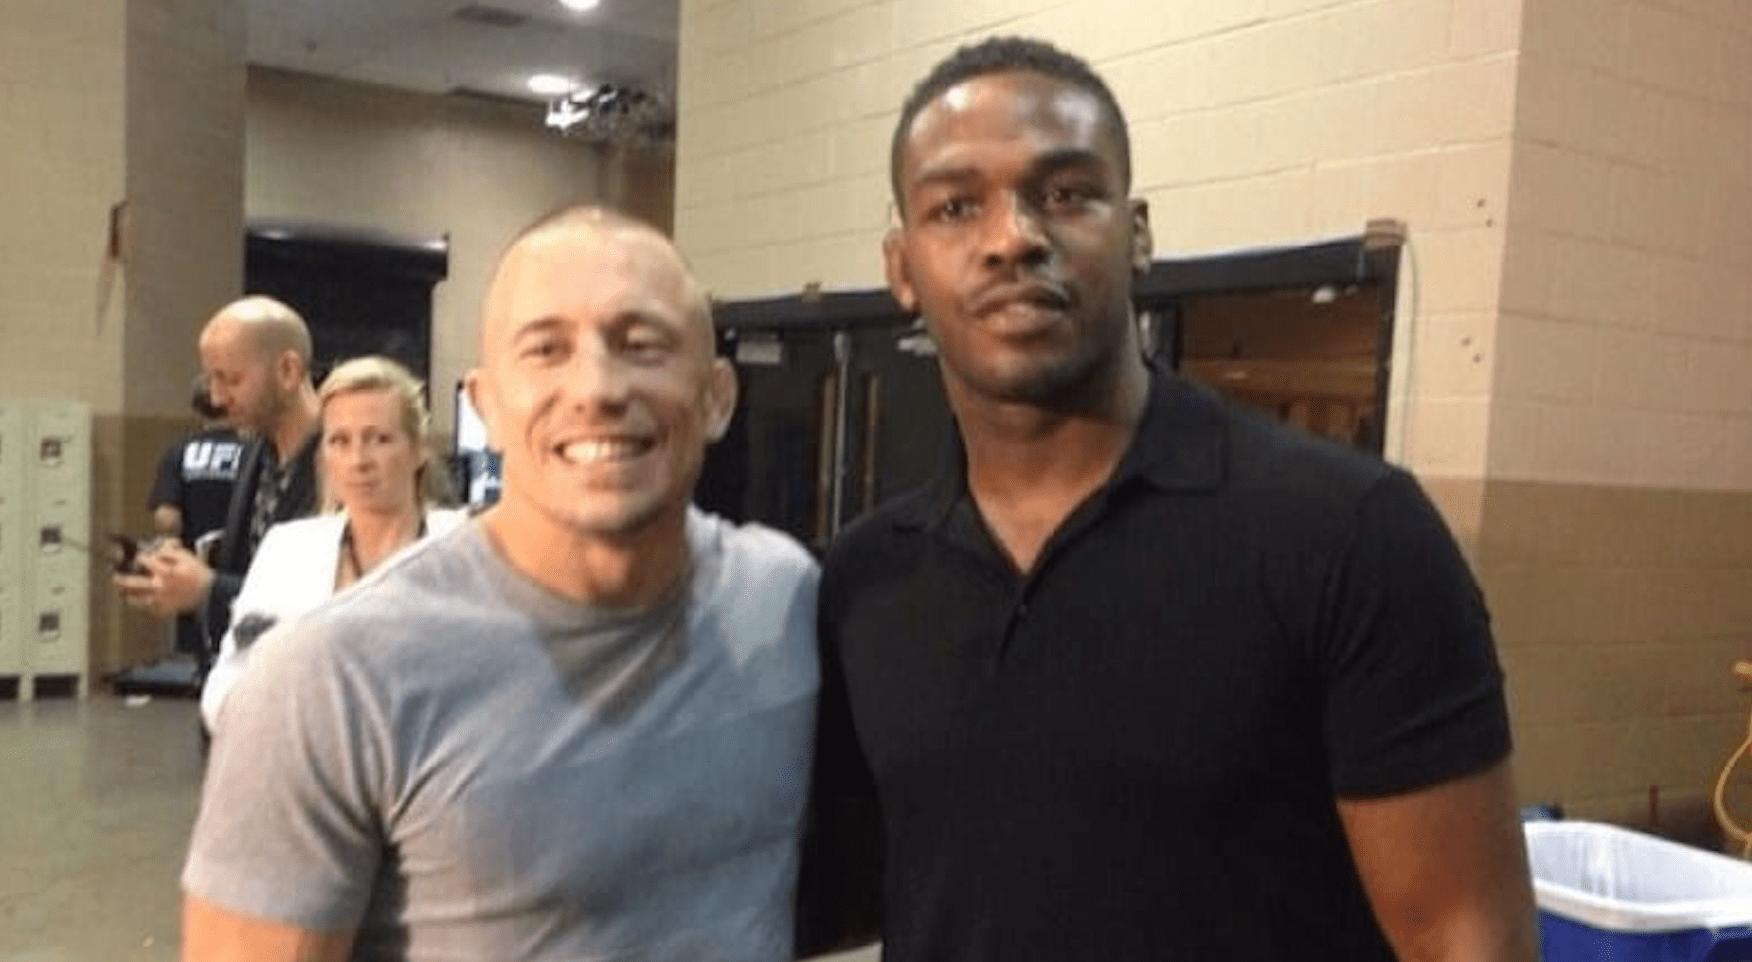 UFC: Georges St-Pierre Offers Jon Jones Some Advice